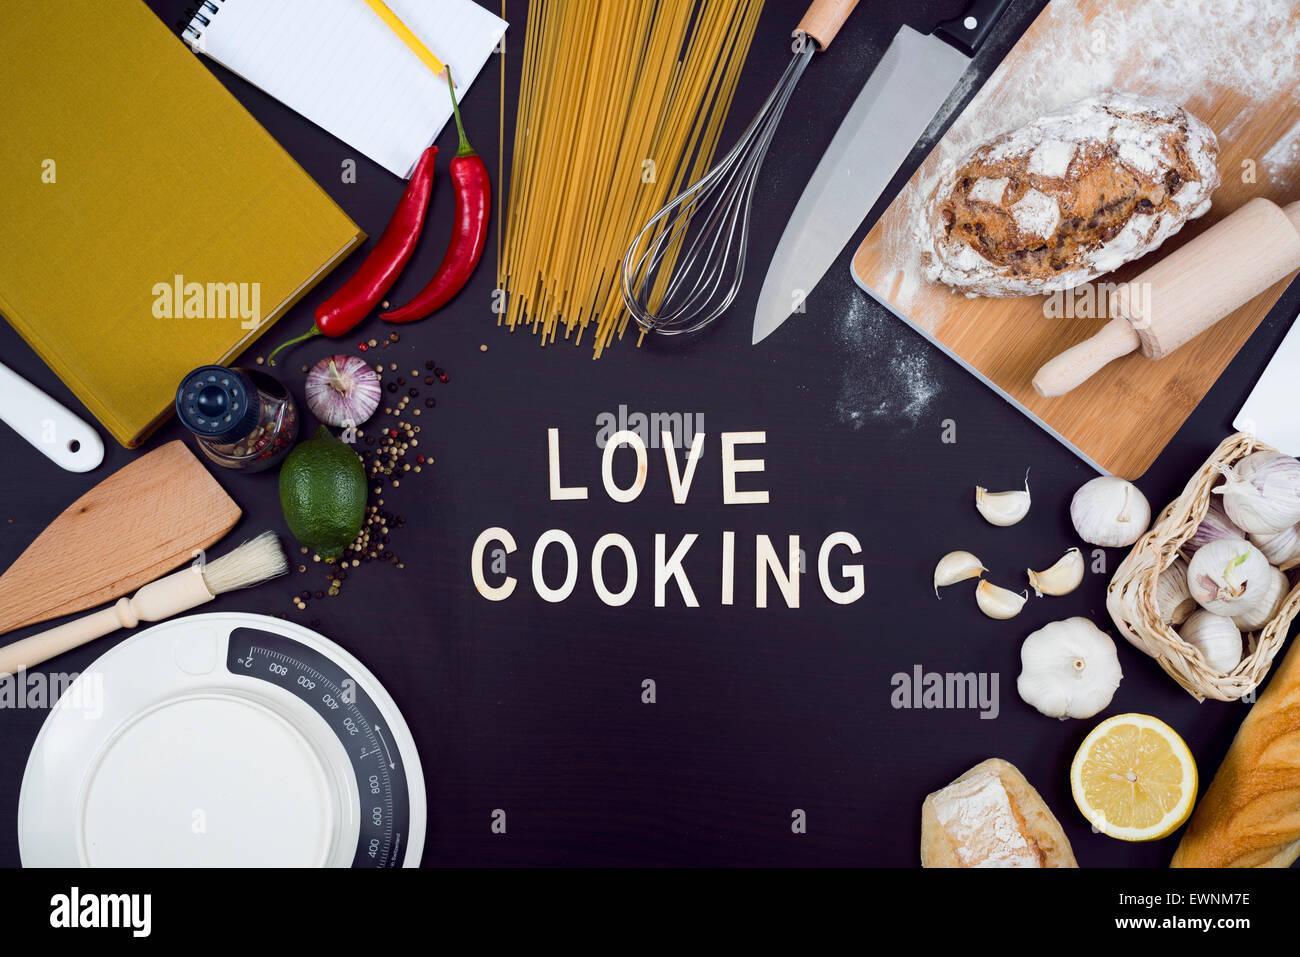 Love cooking hero header for restaurant or cooking website - Stock Image